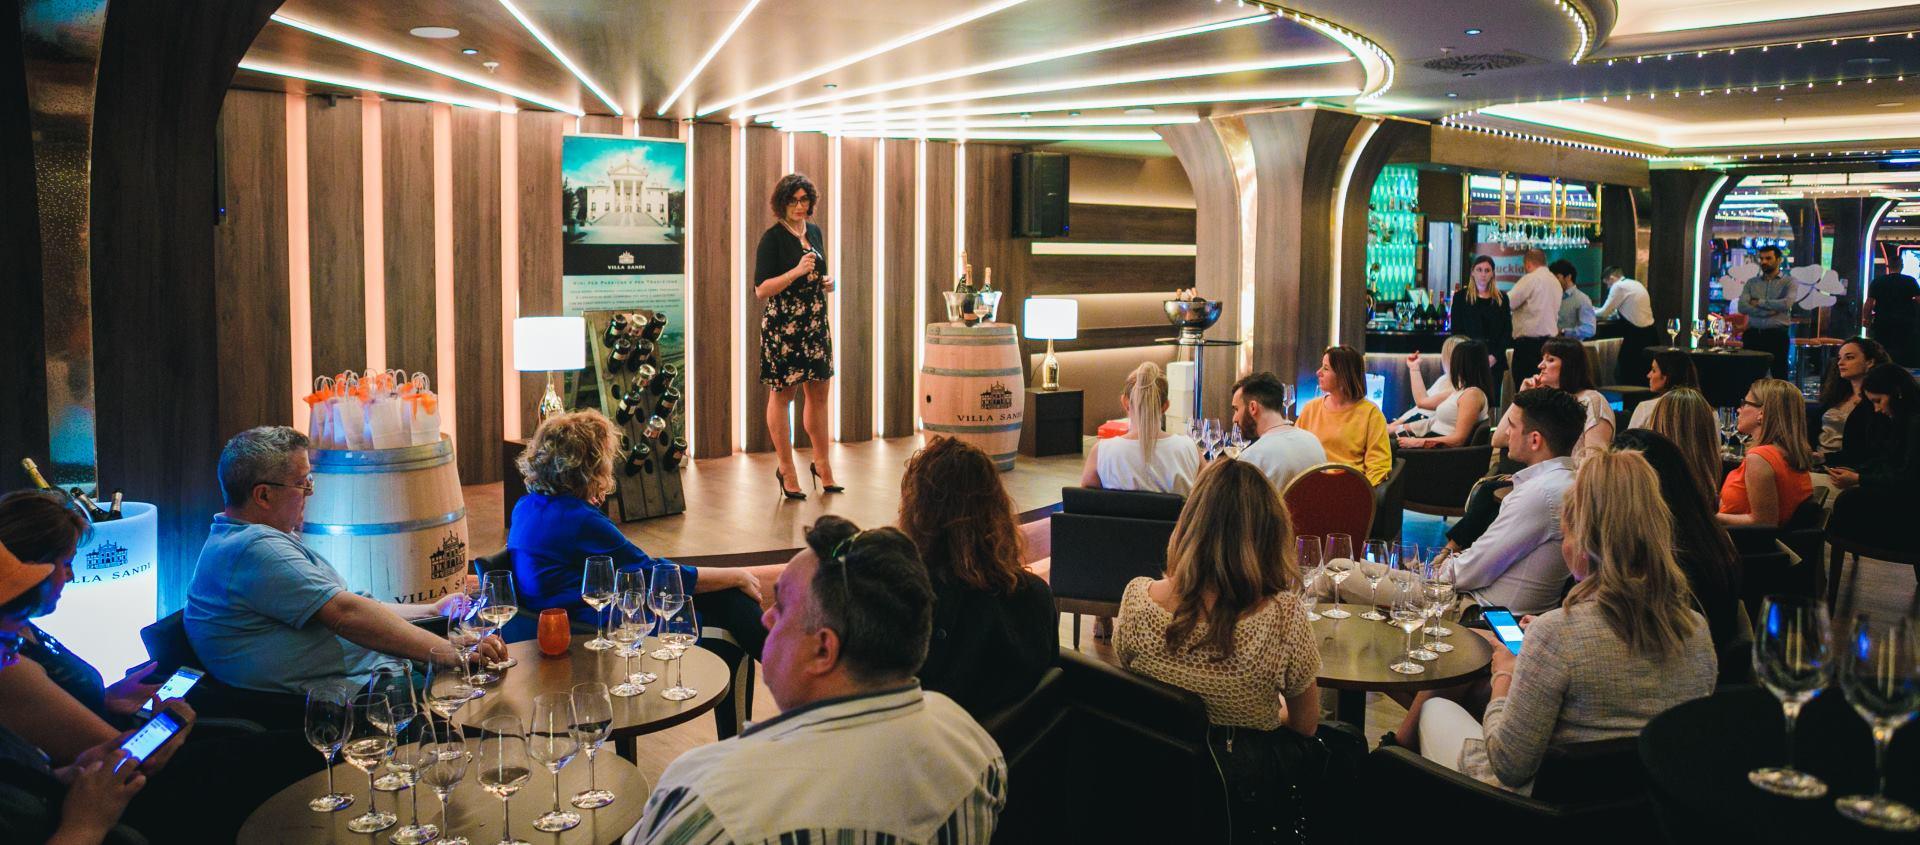 Miva galerija vina organizirala promociju poznatih talijanskih pjenušaca Villa Sandi